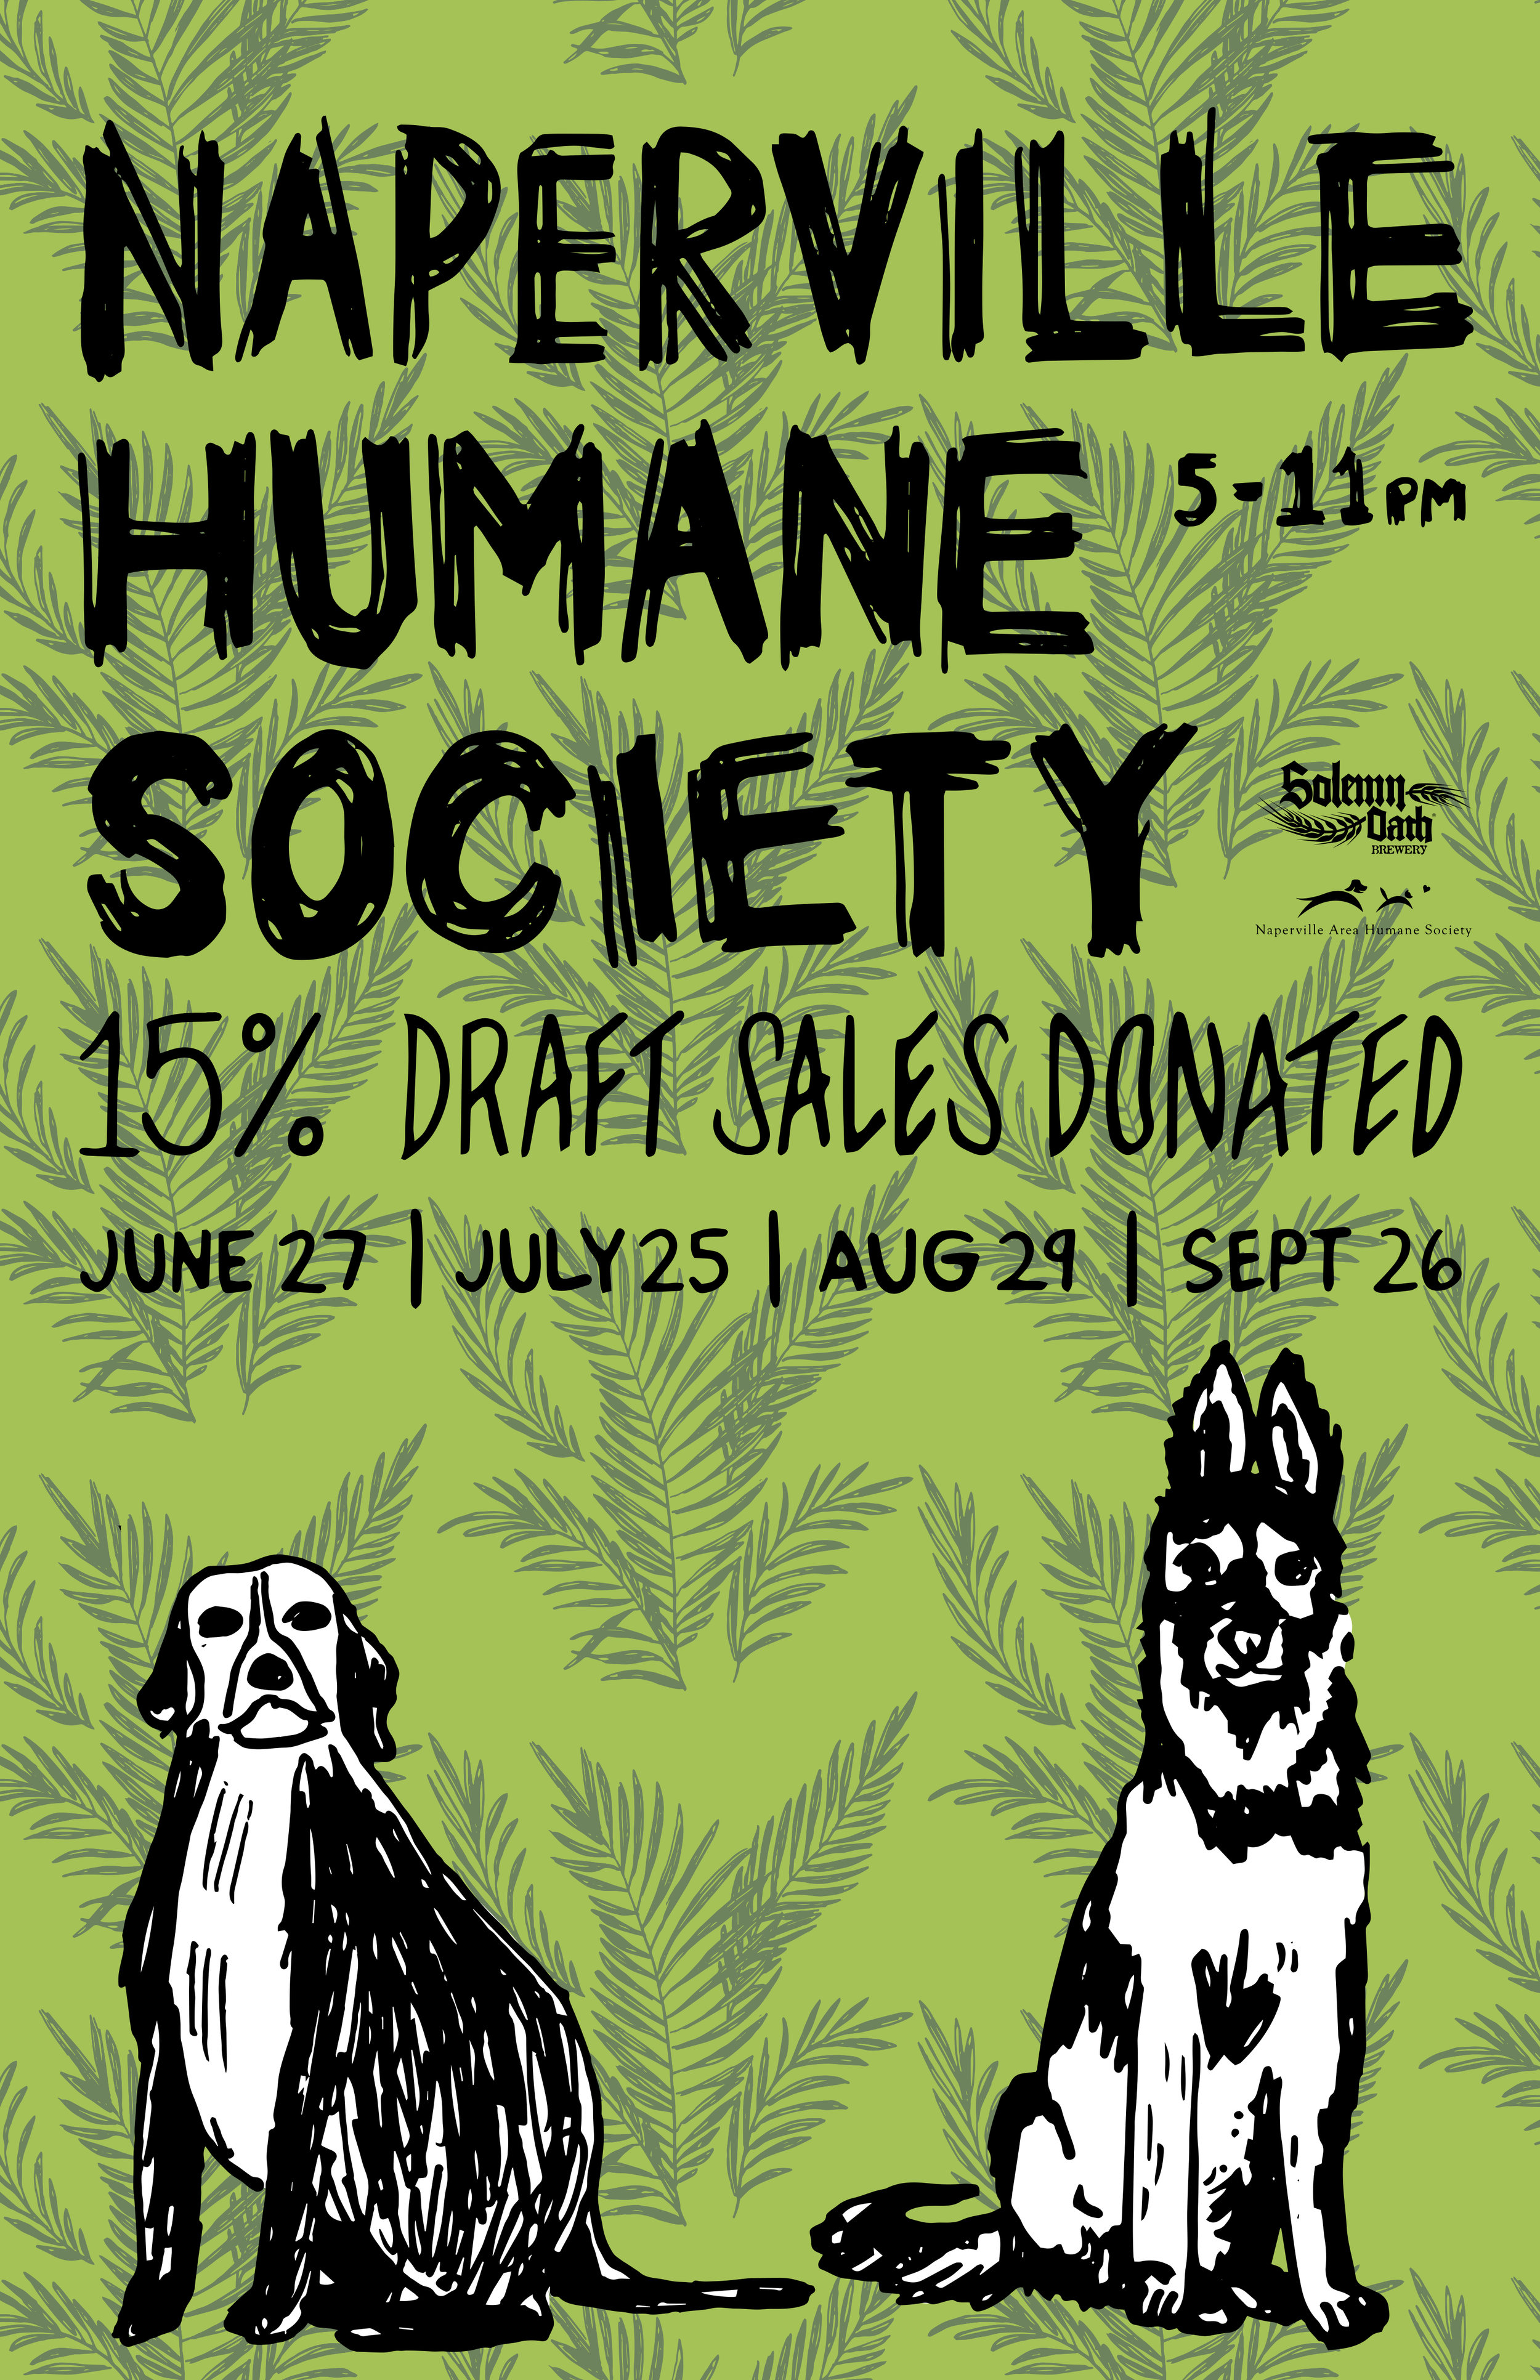 Naperville Humane Society 11x17 (2).jpg